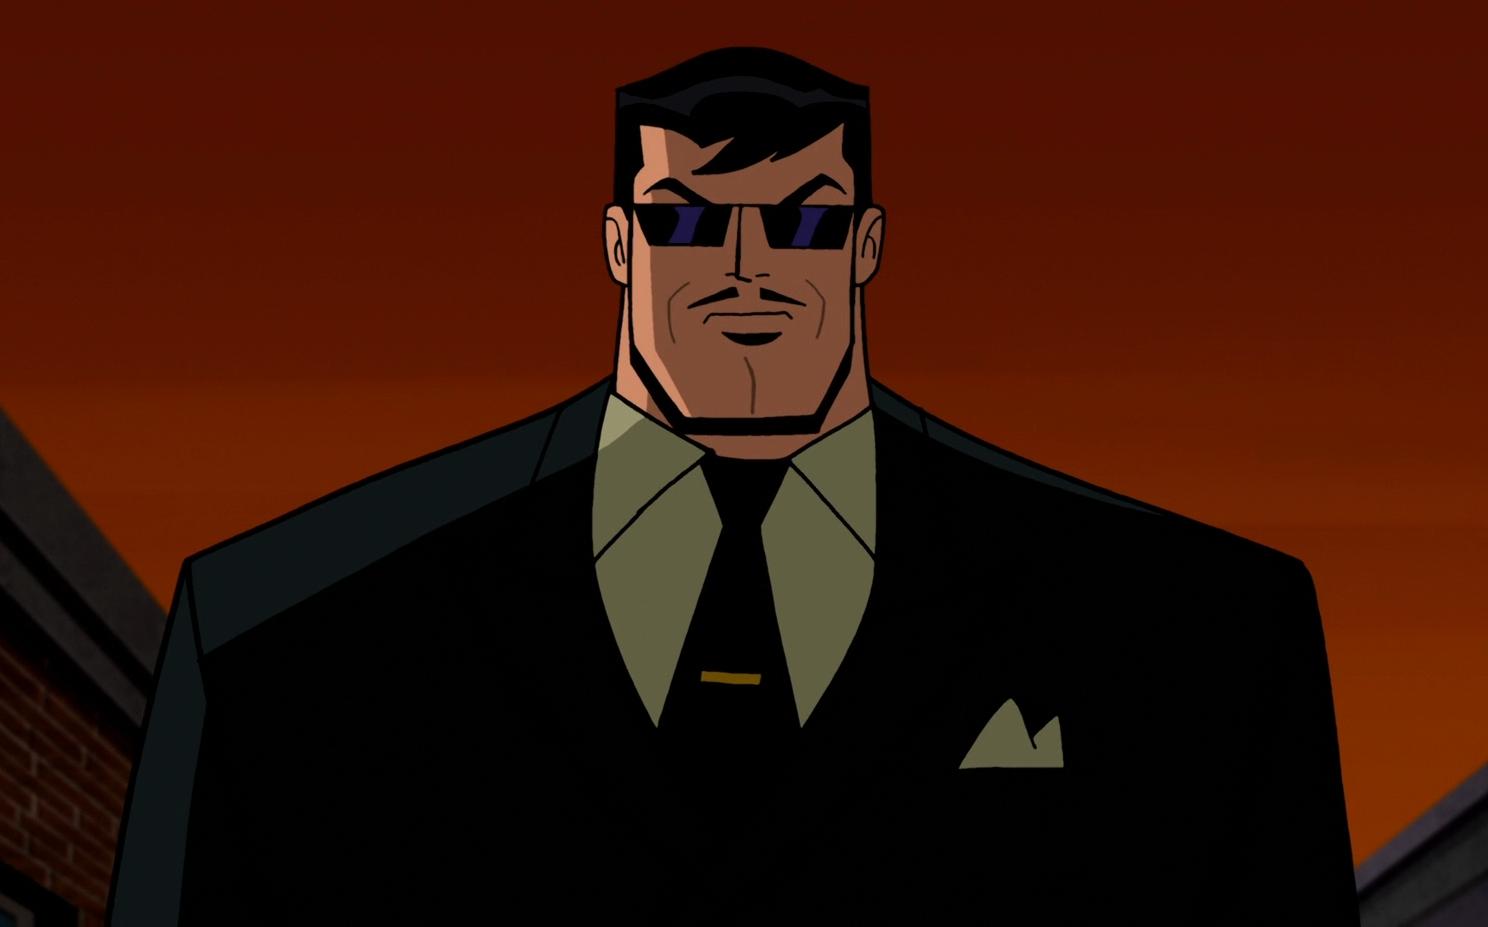 File:Bruce Wayne BTBATB 007.png